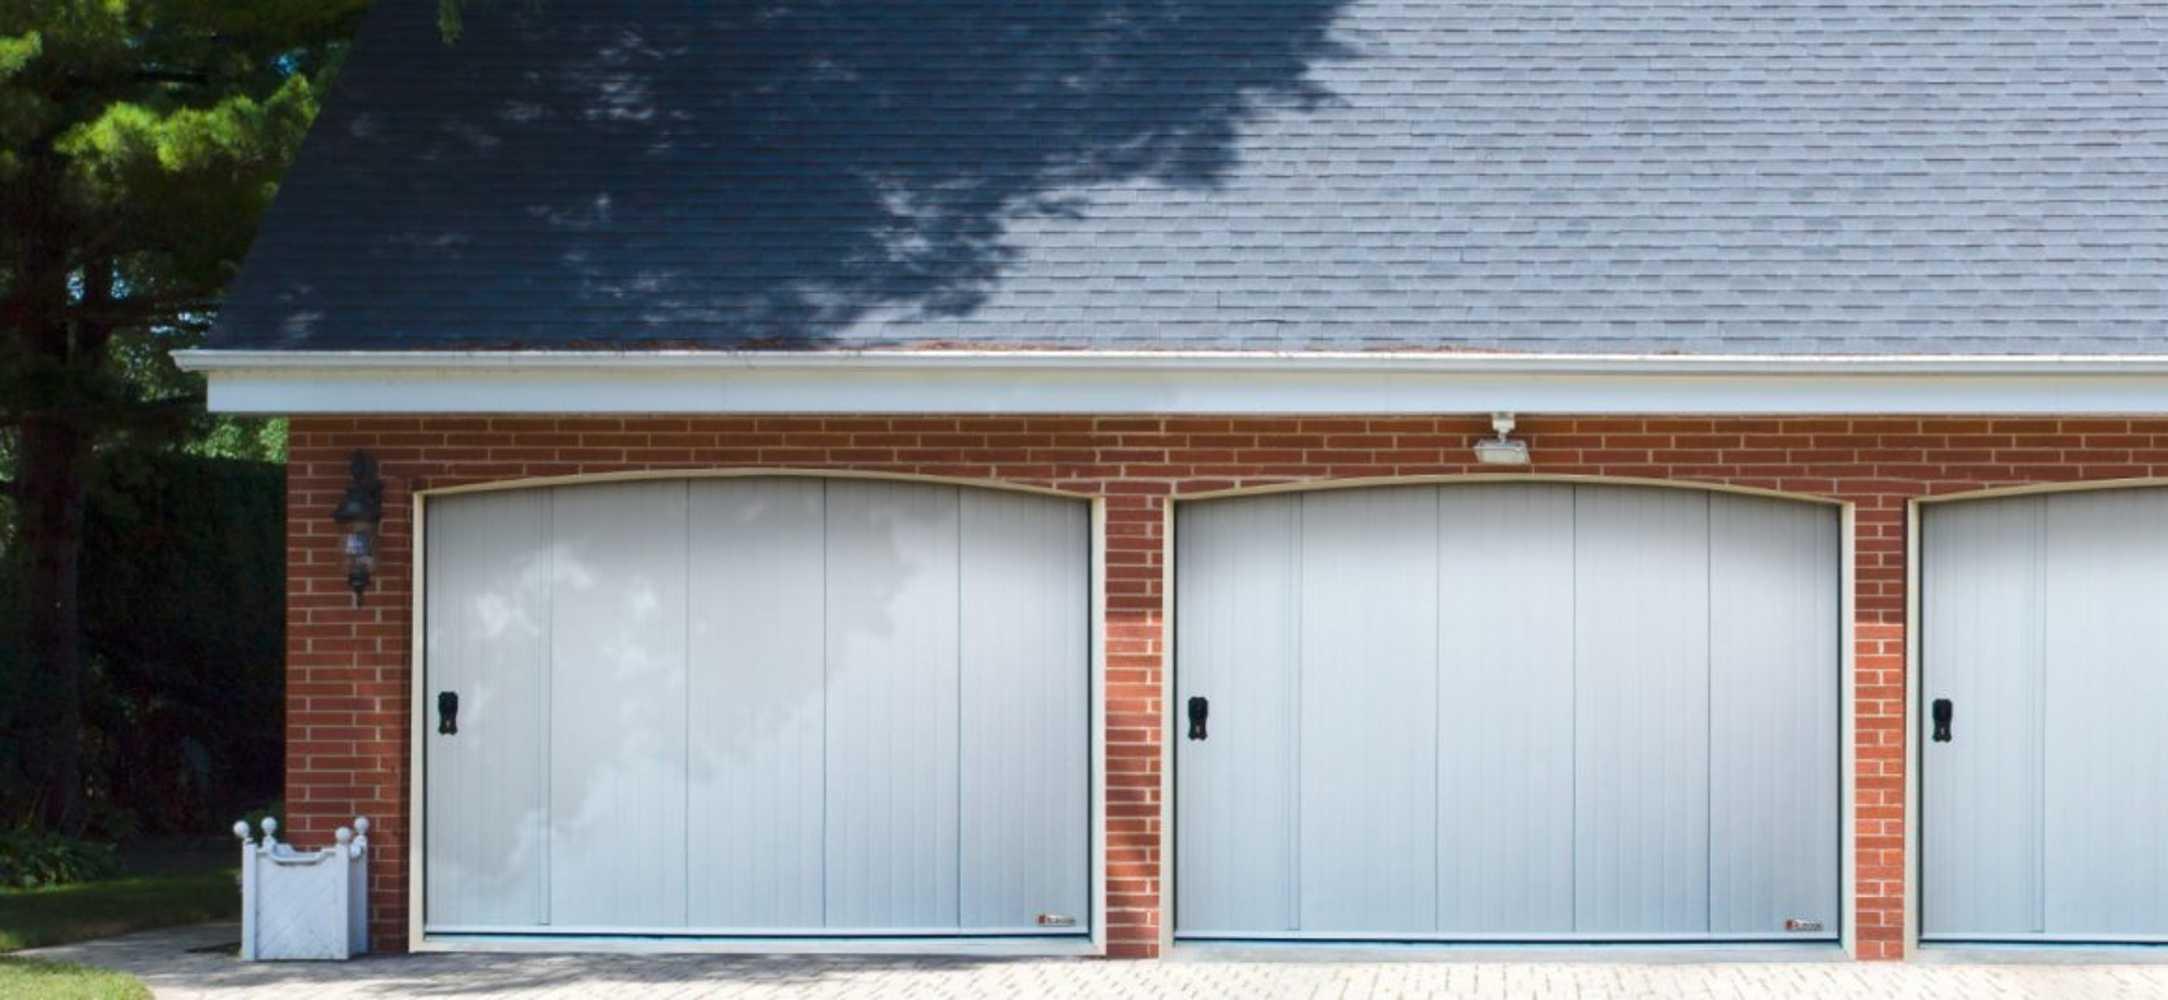 Gamme classique - Porte de garage Aludoor classique2